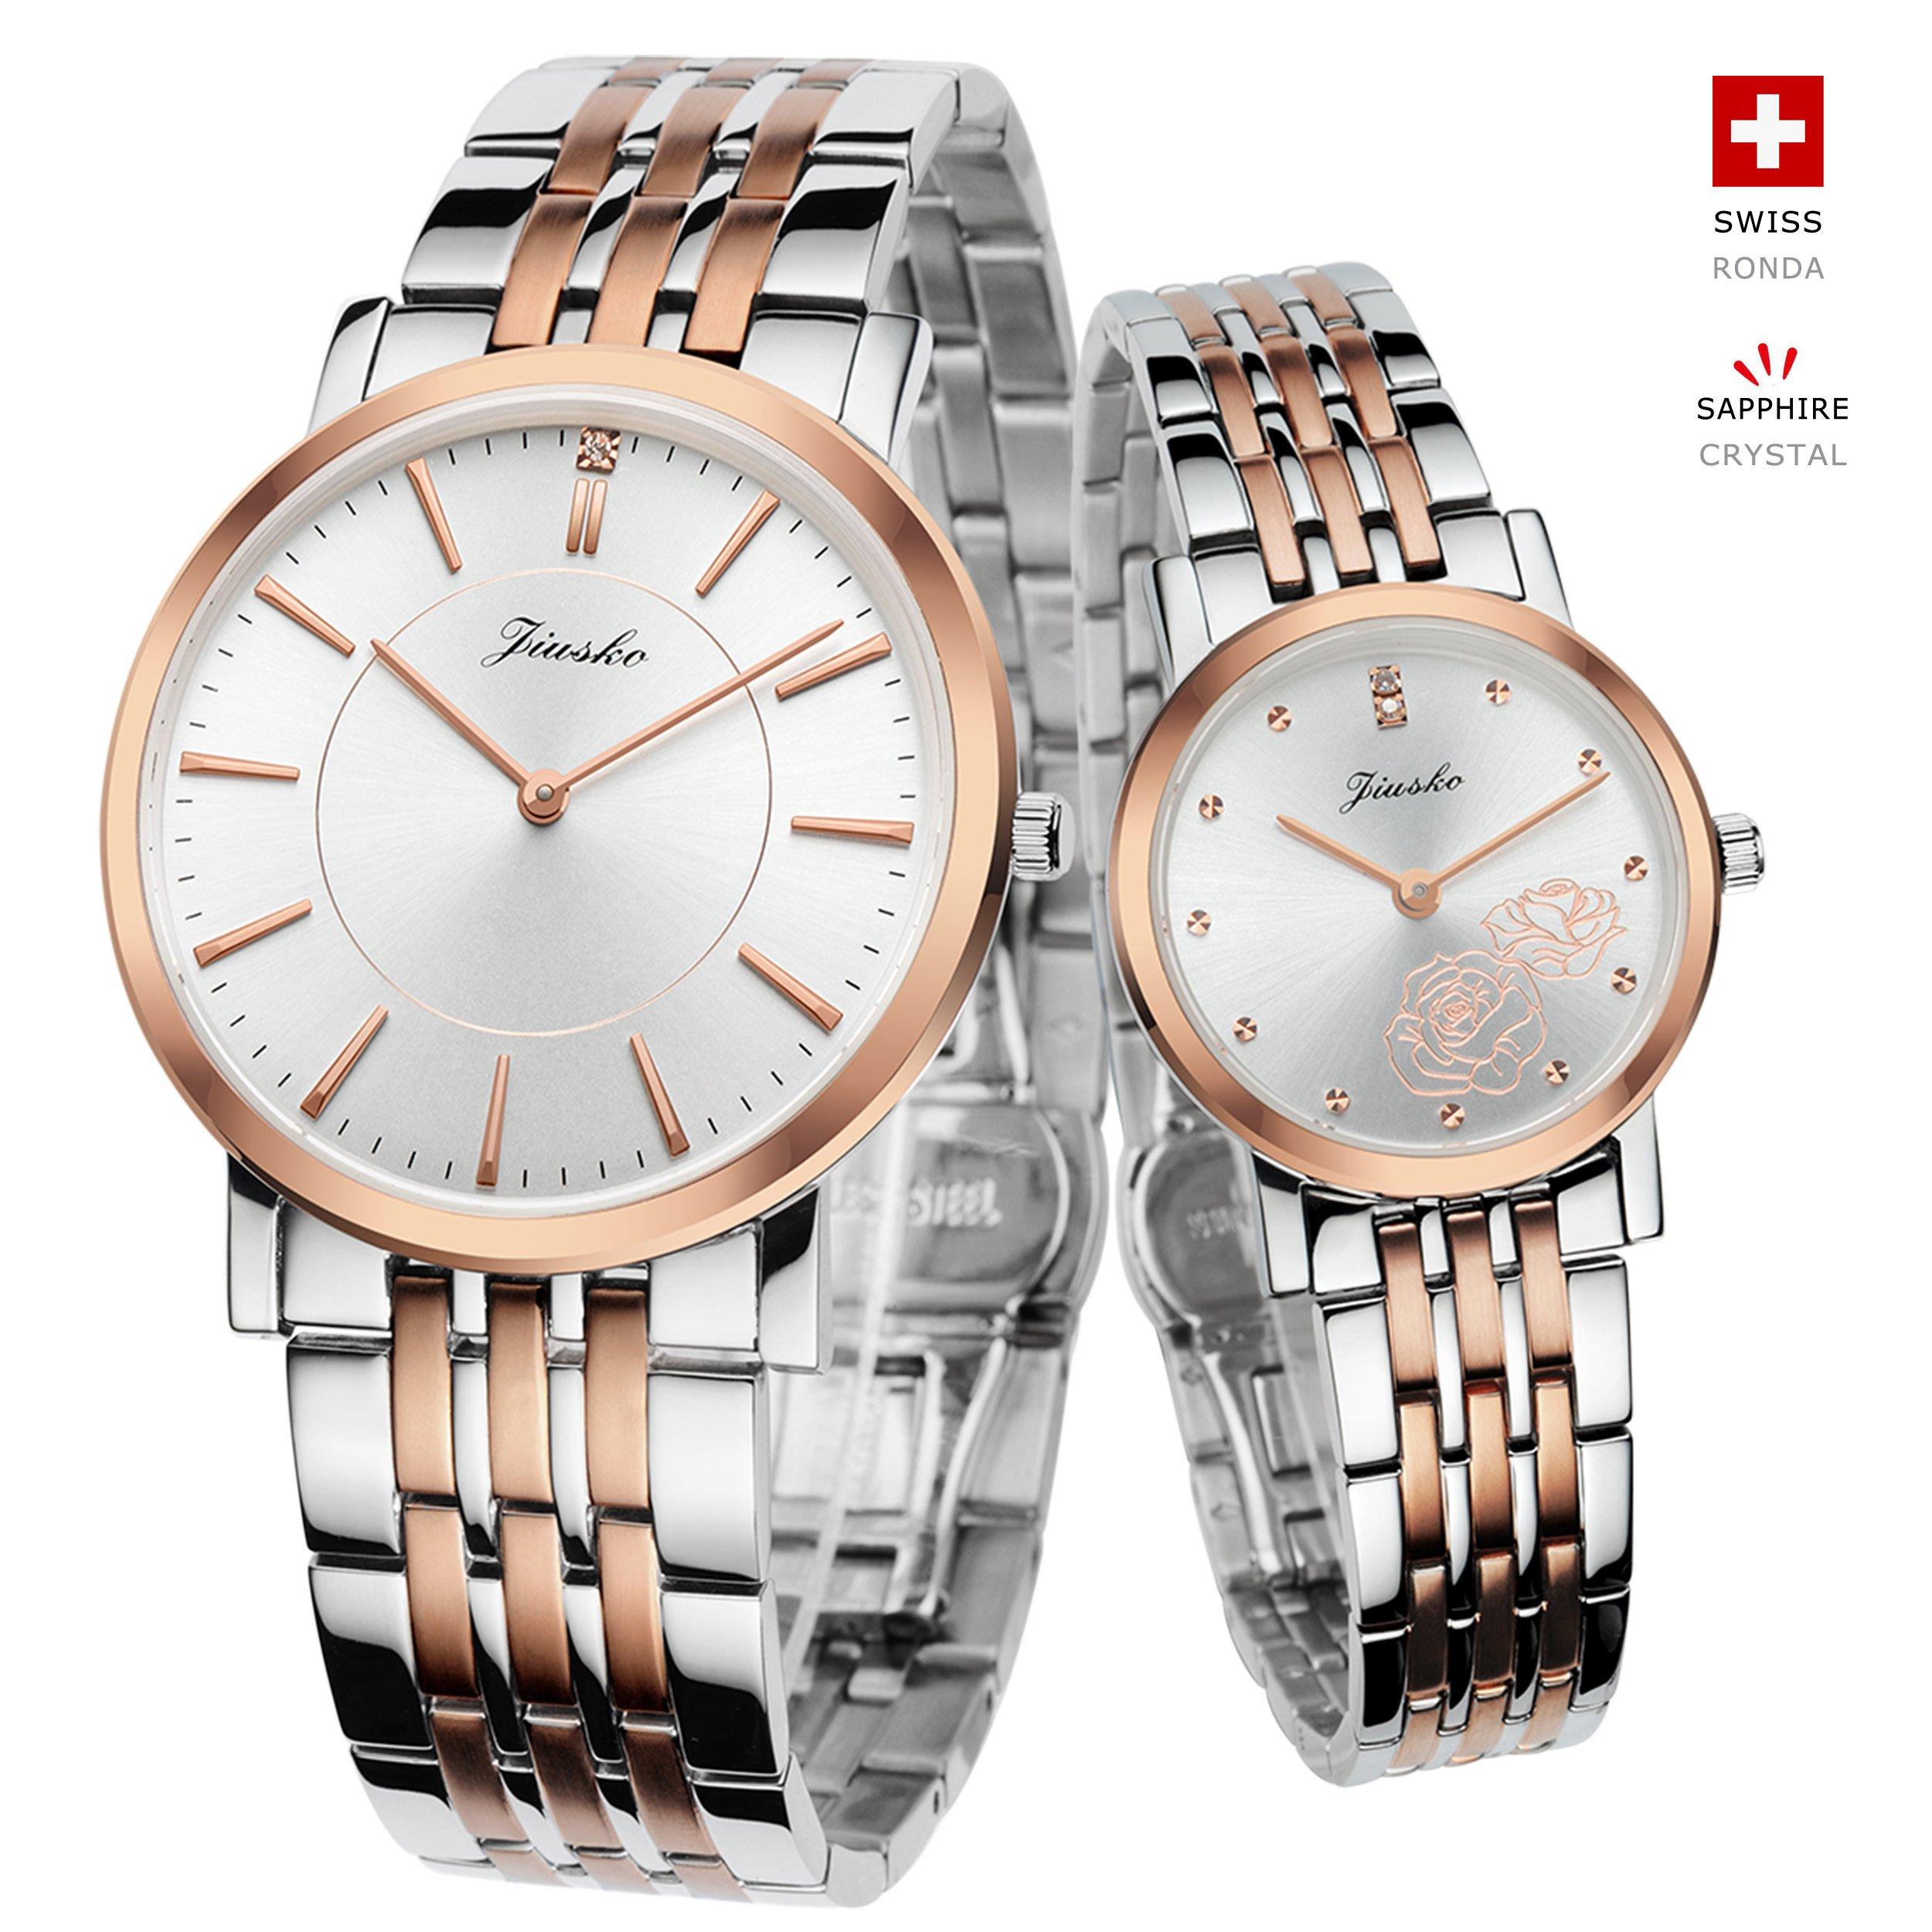 Jiusko Swiss - His & Hers Couple Wrist Watches Gift Set - Real Diamond - Sapphire - Two Tone … (Two-Tone)